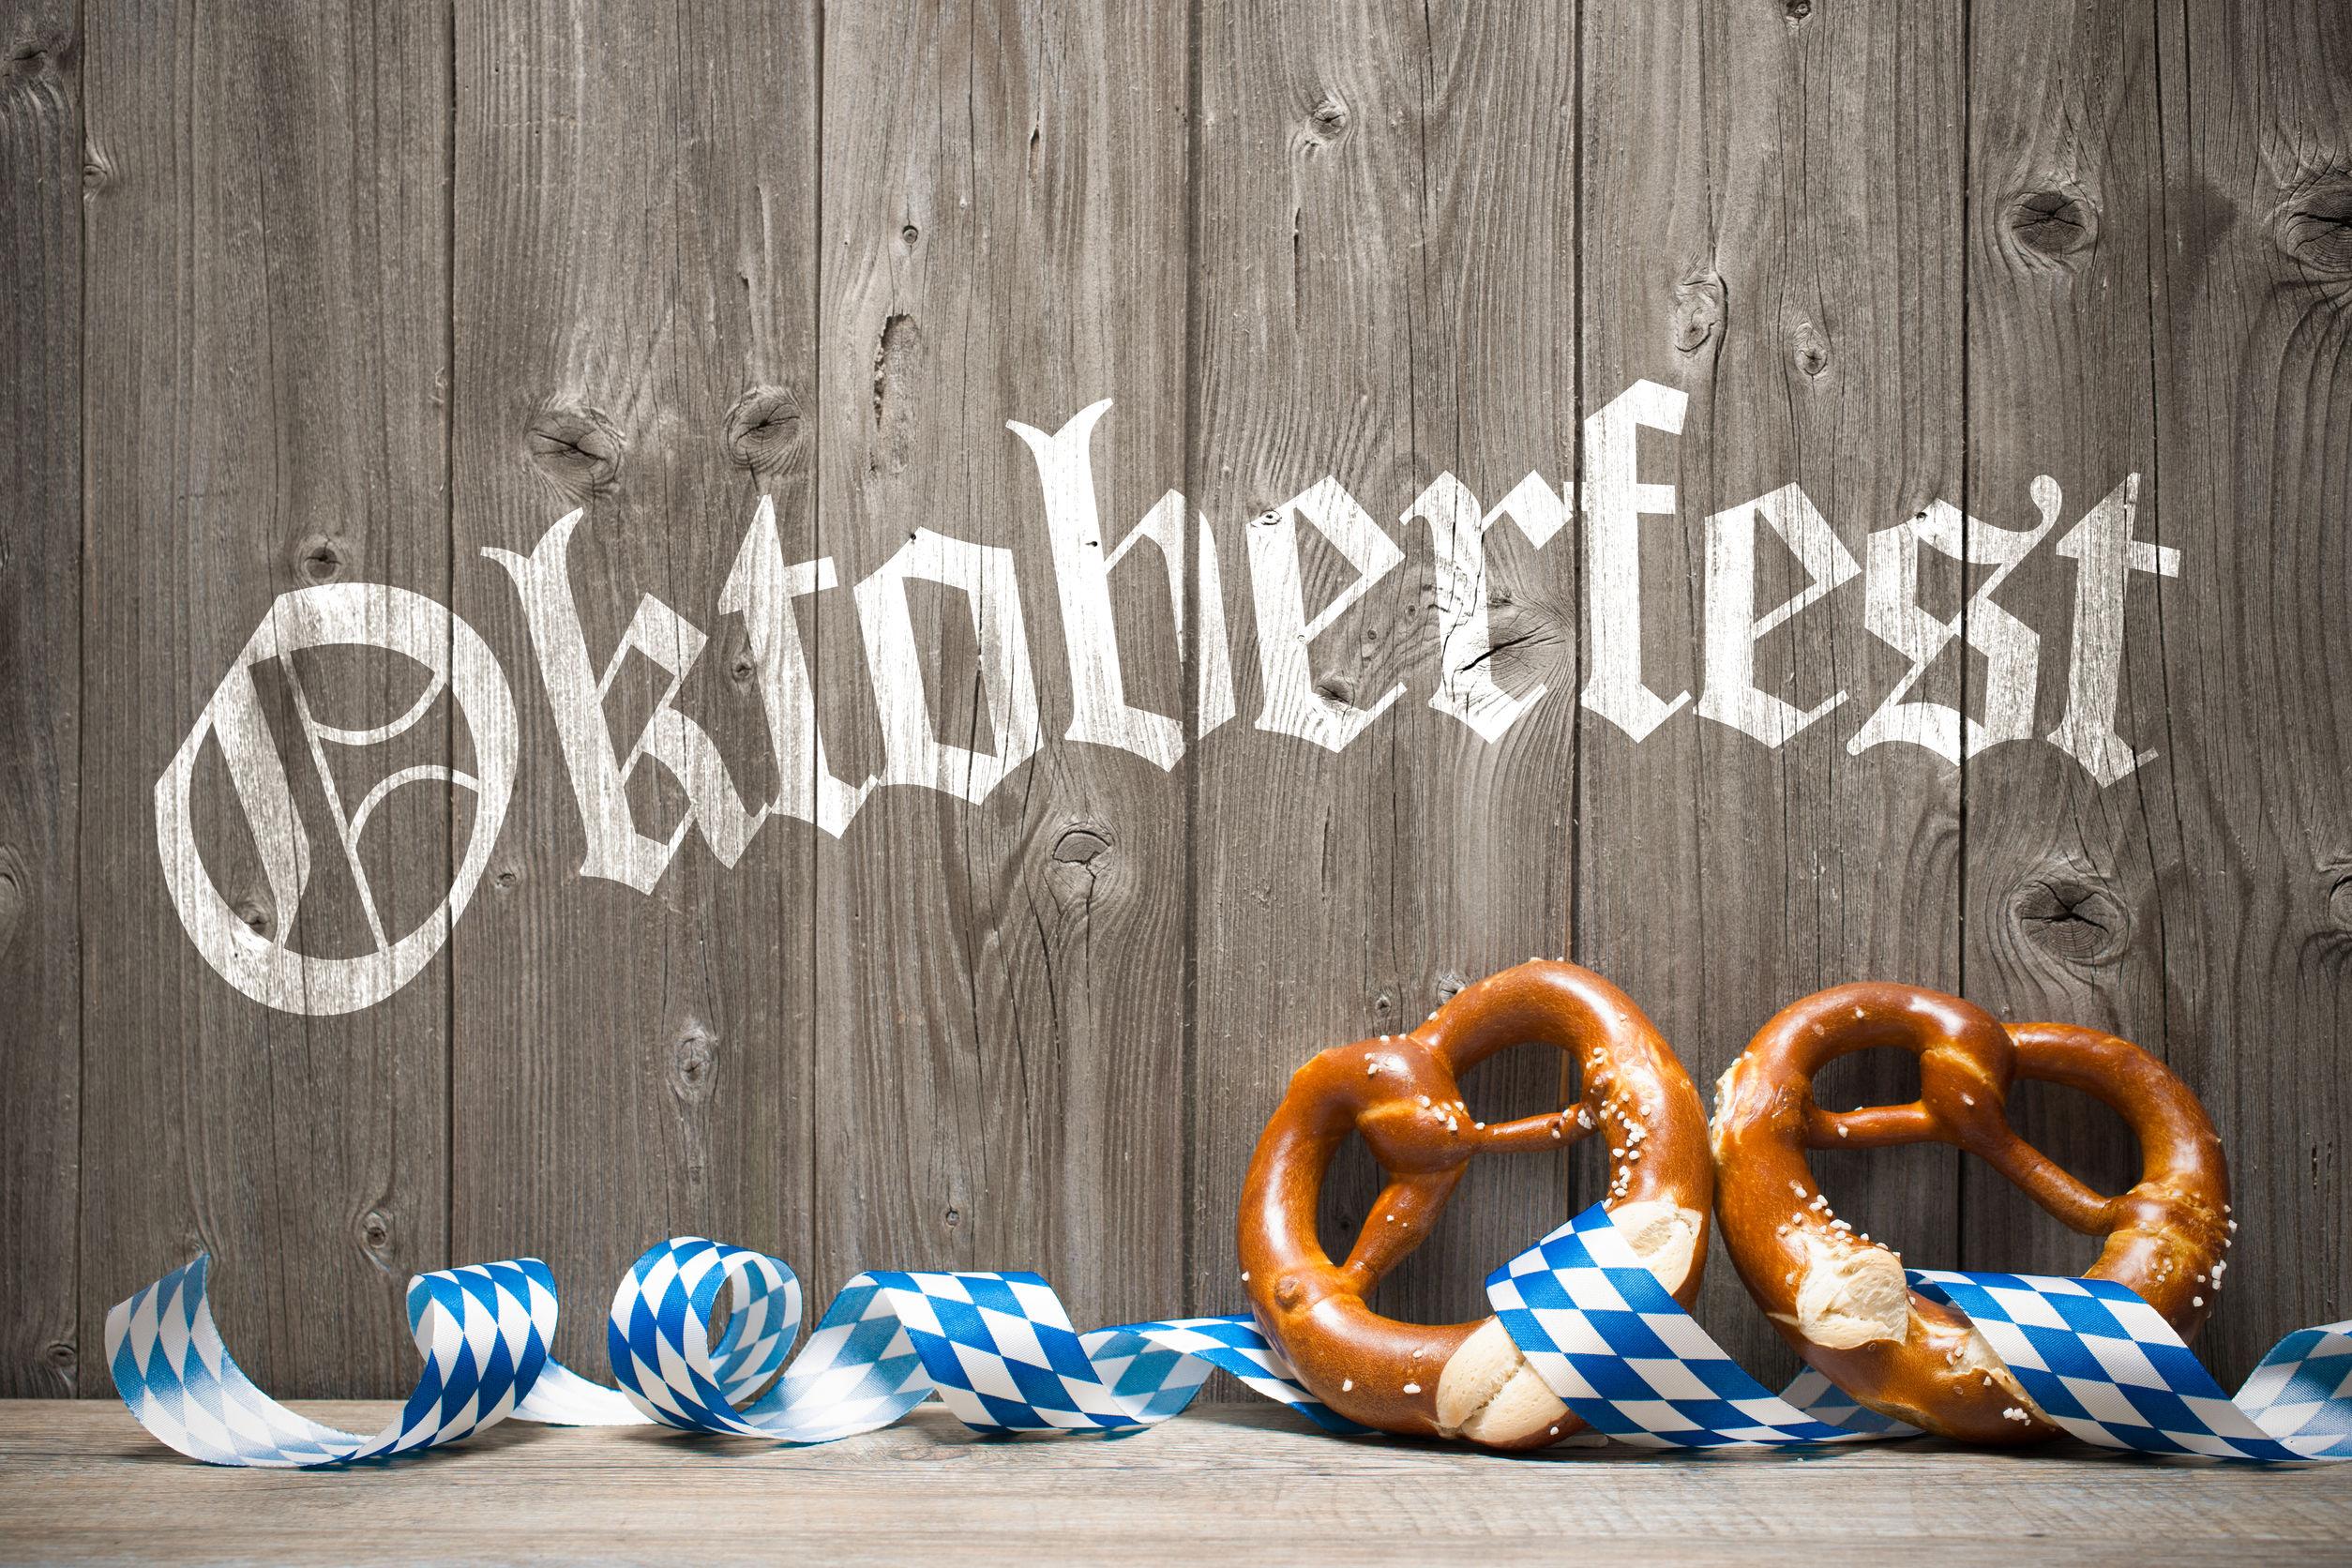 druhy-rocnik-oktoberfestu-miri-na-andel